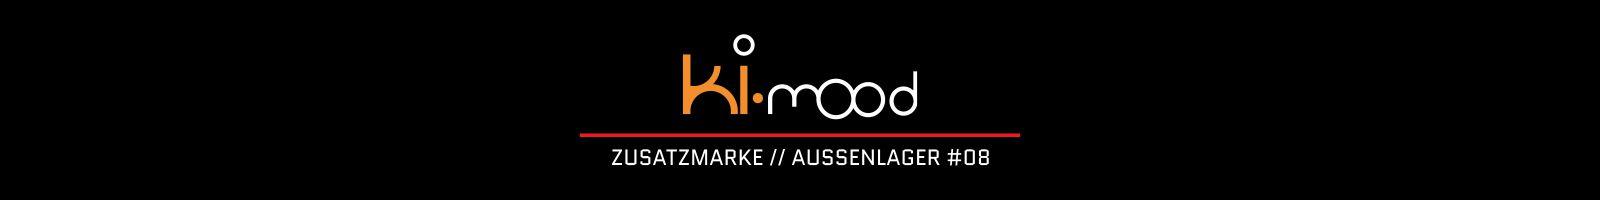 Kategorie-Marken => KiMood